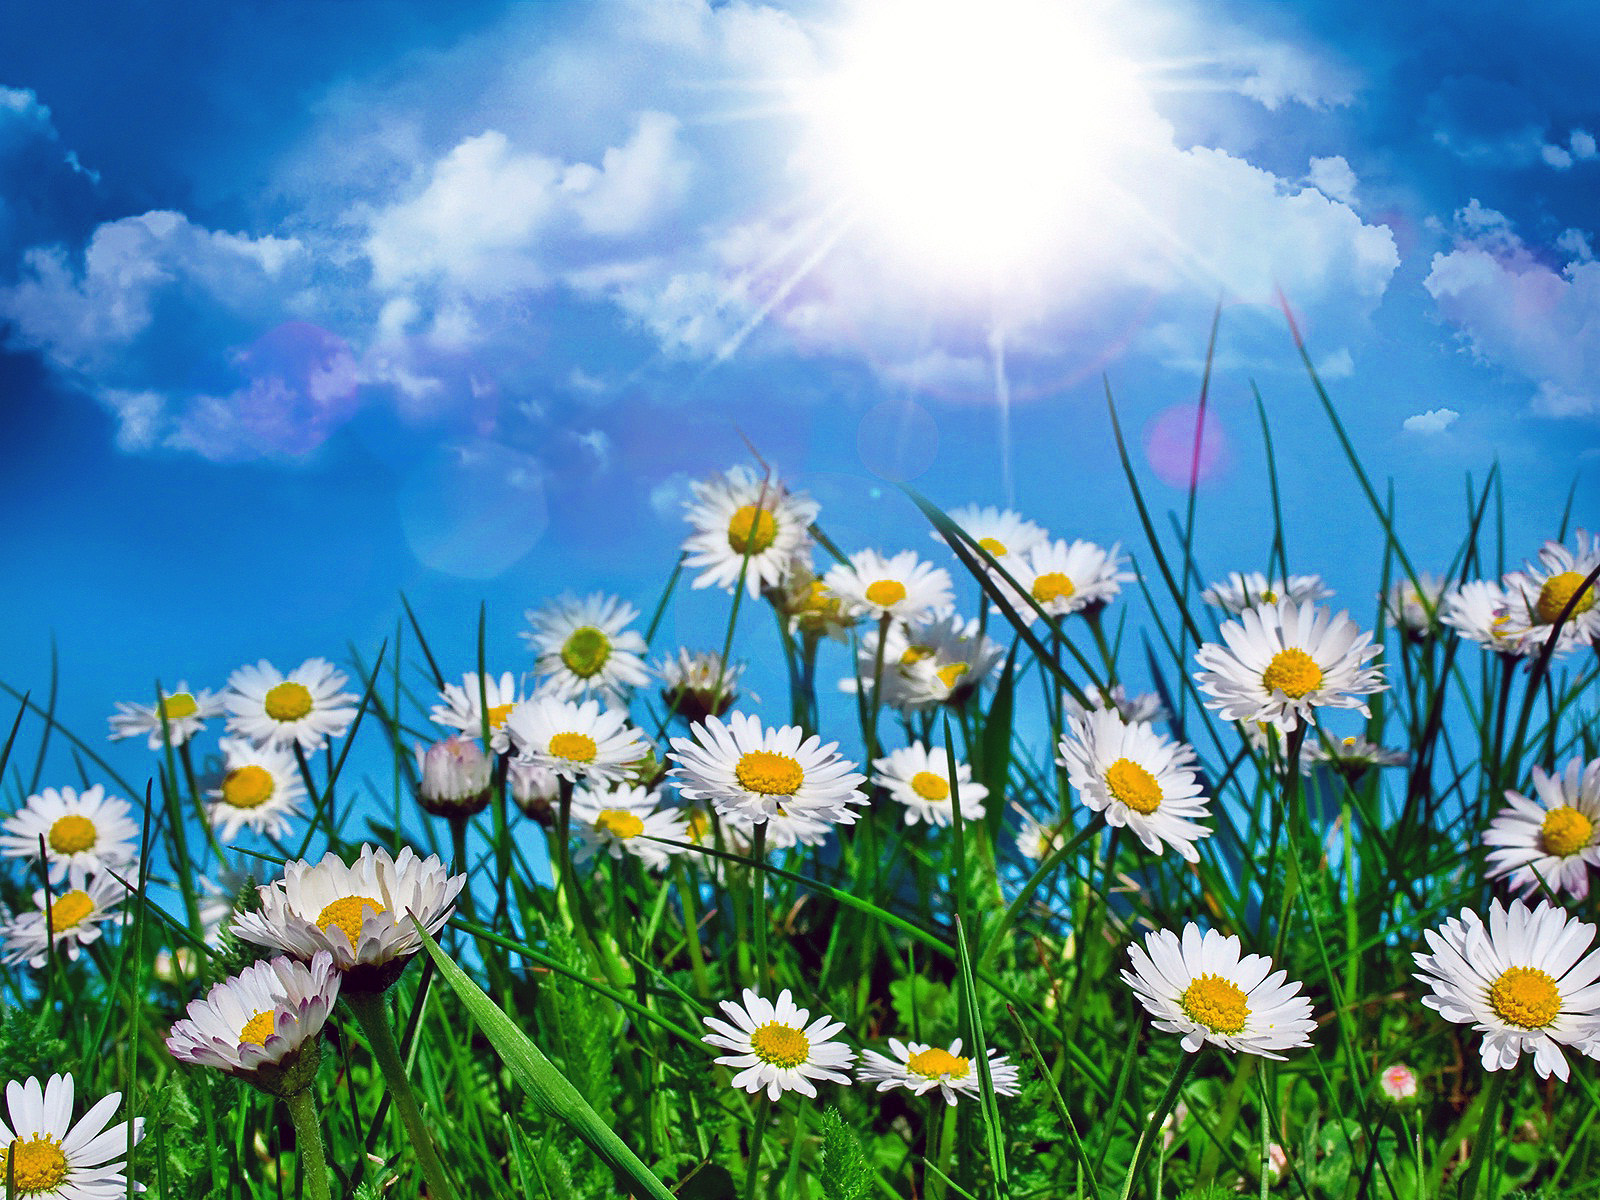 Ромашки под солнцем, бесконечное лето обои на андроид, 1600 на 1200 пикселей